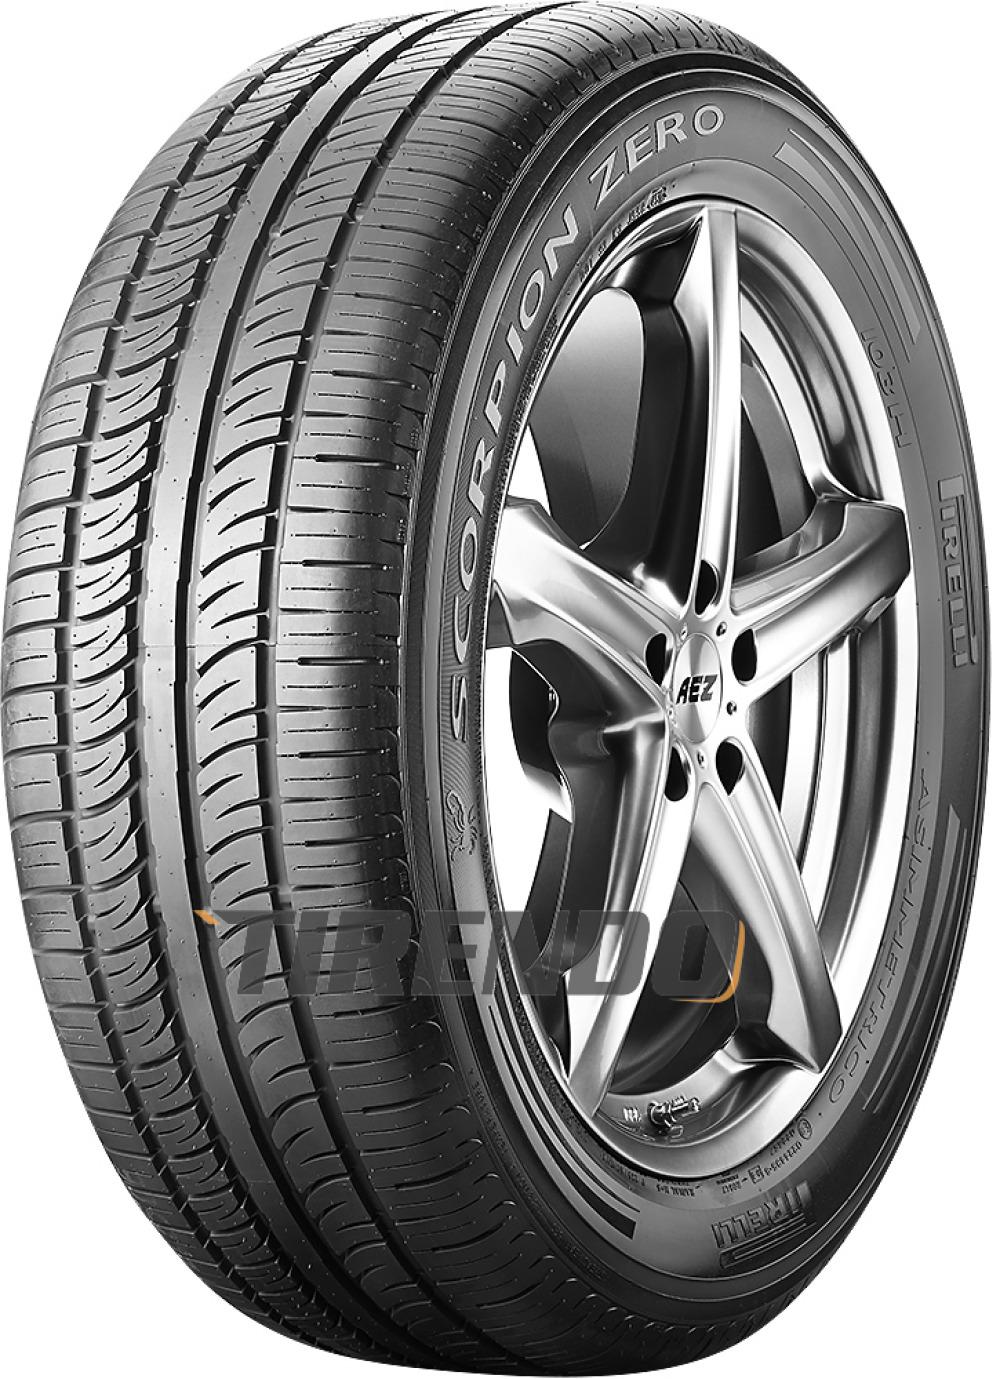 Pirelli Scorpion Zero Asimmetrico ( 305/35 ZR22 (110Y) XL )